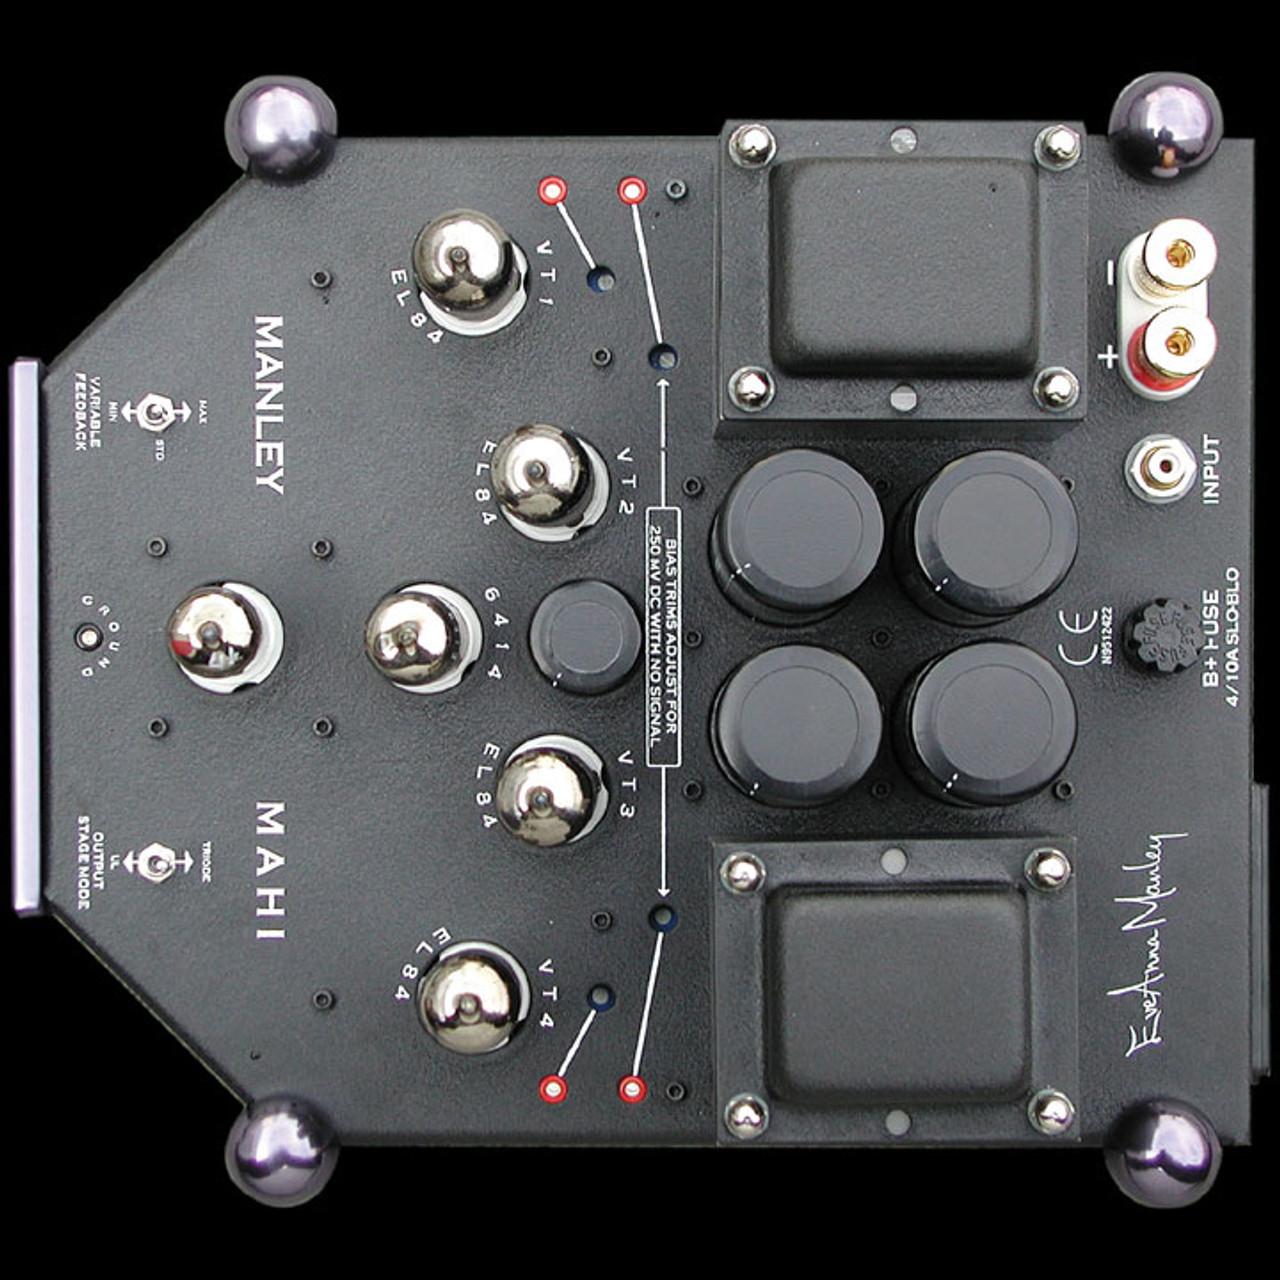 Manley Mahi monoblock amplifiers